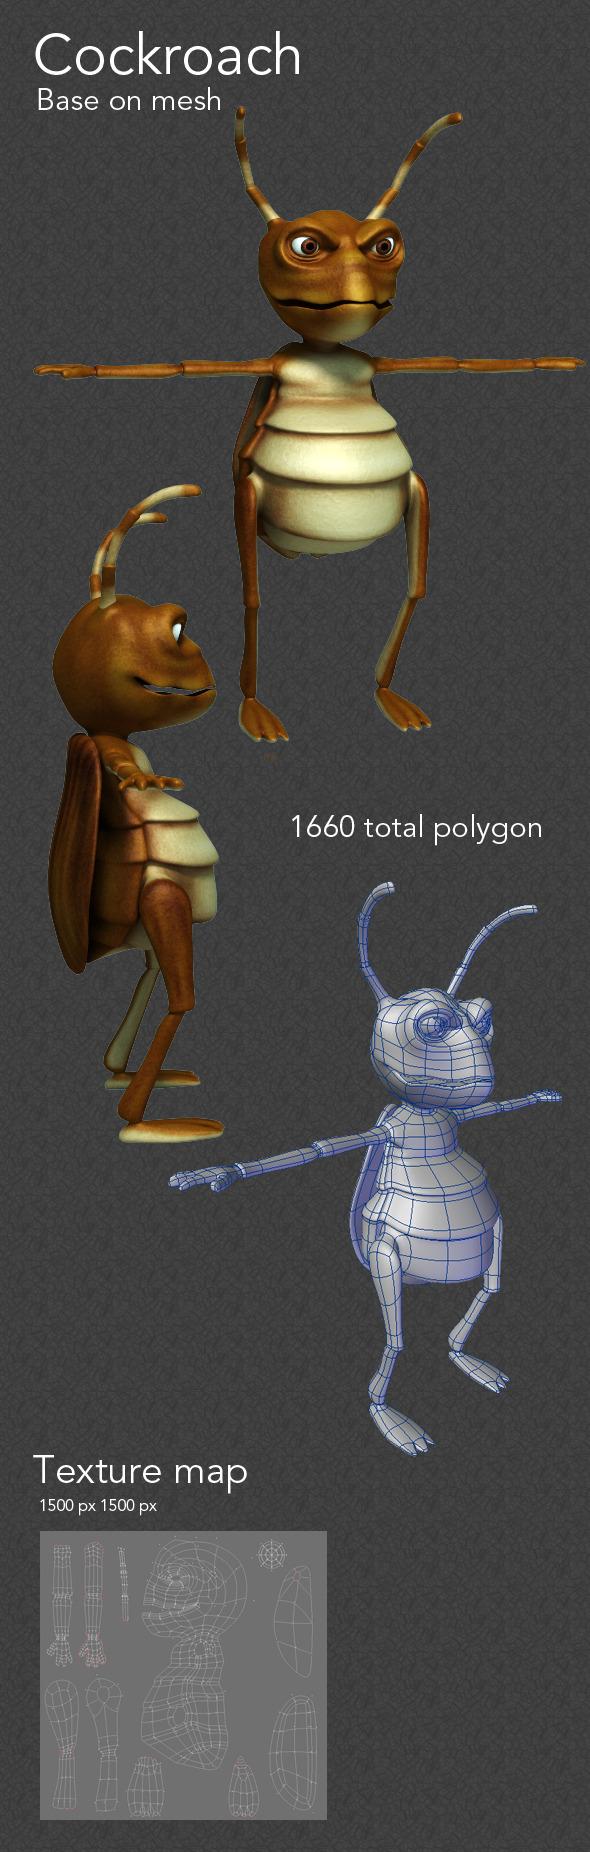 cockroach  - 3DOcean Item for Sale